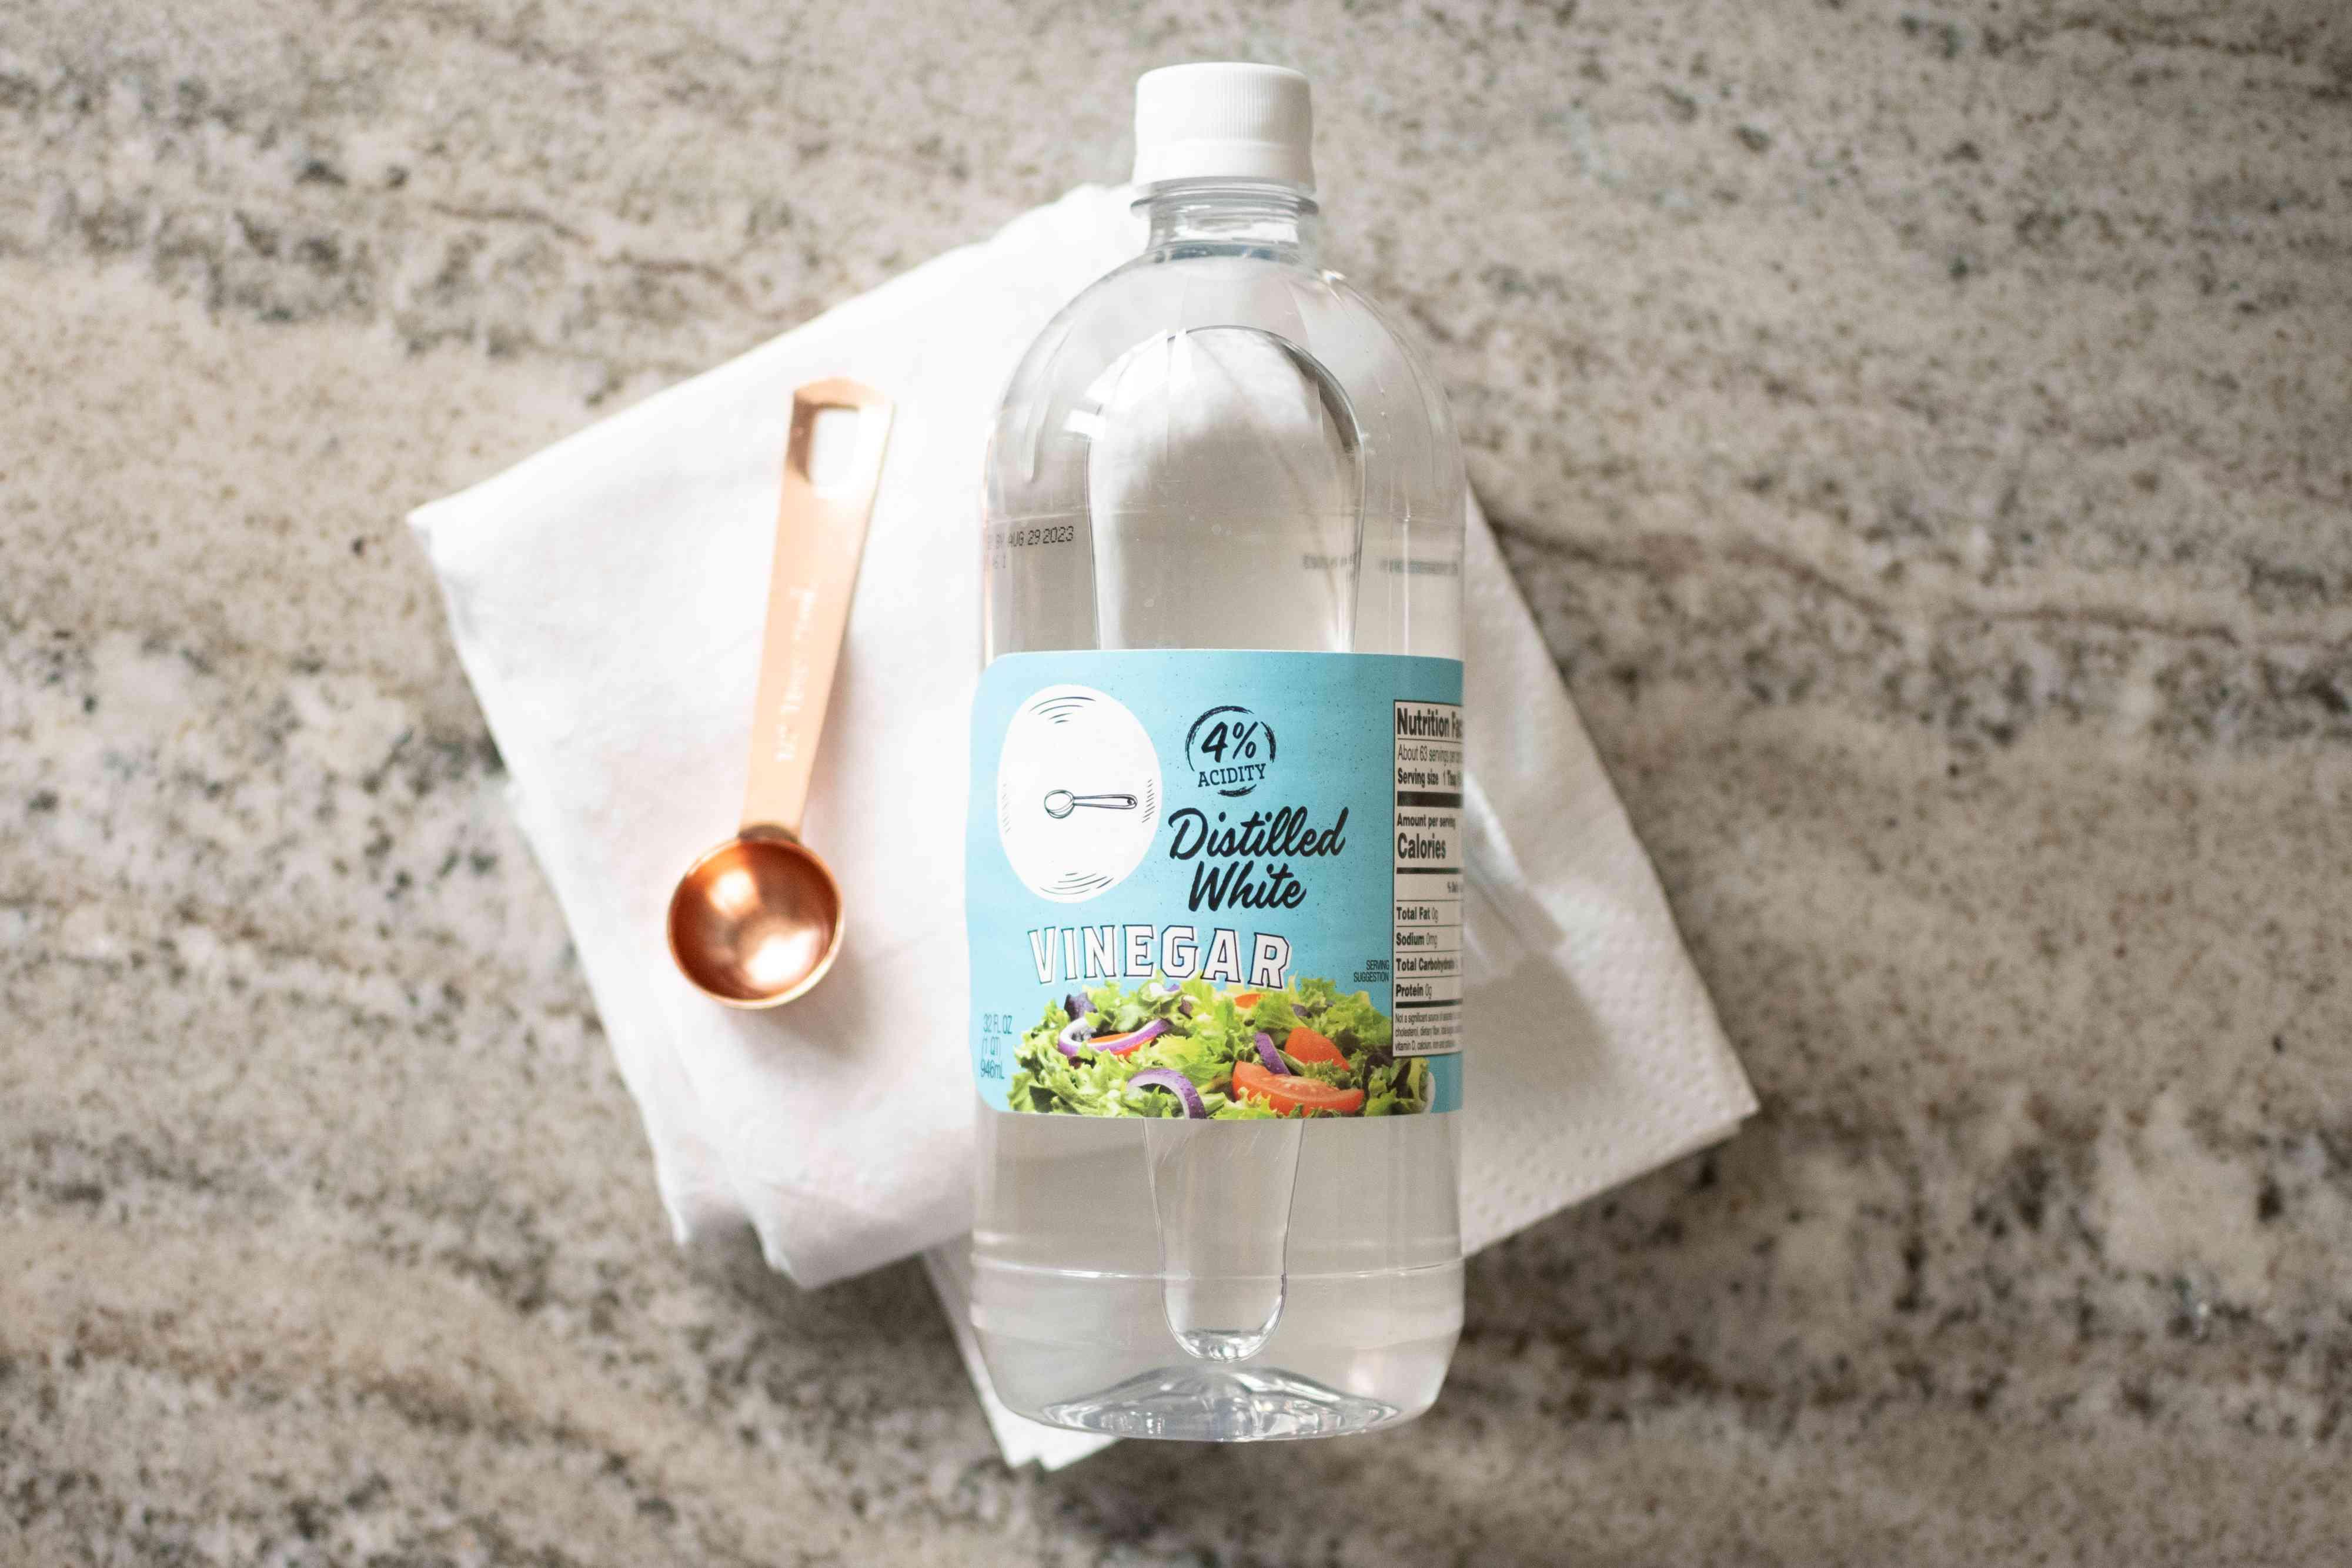 Distilled white vinegar bottle folded paper towels and measuring spoon